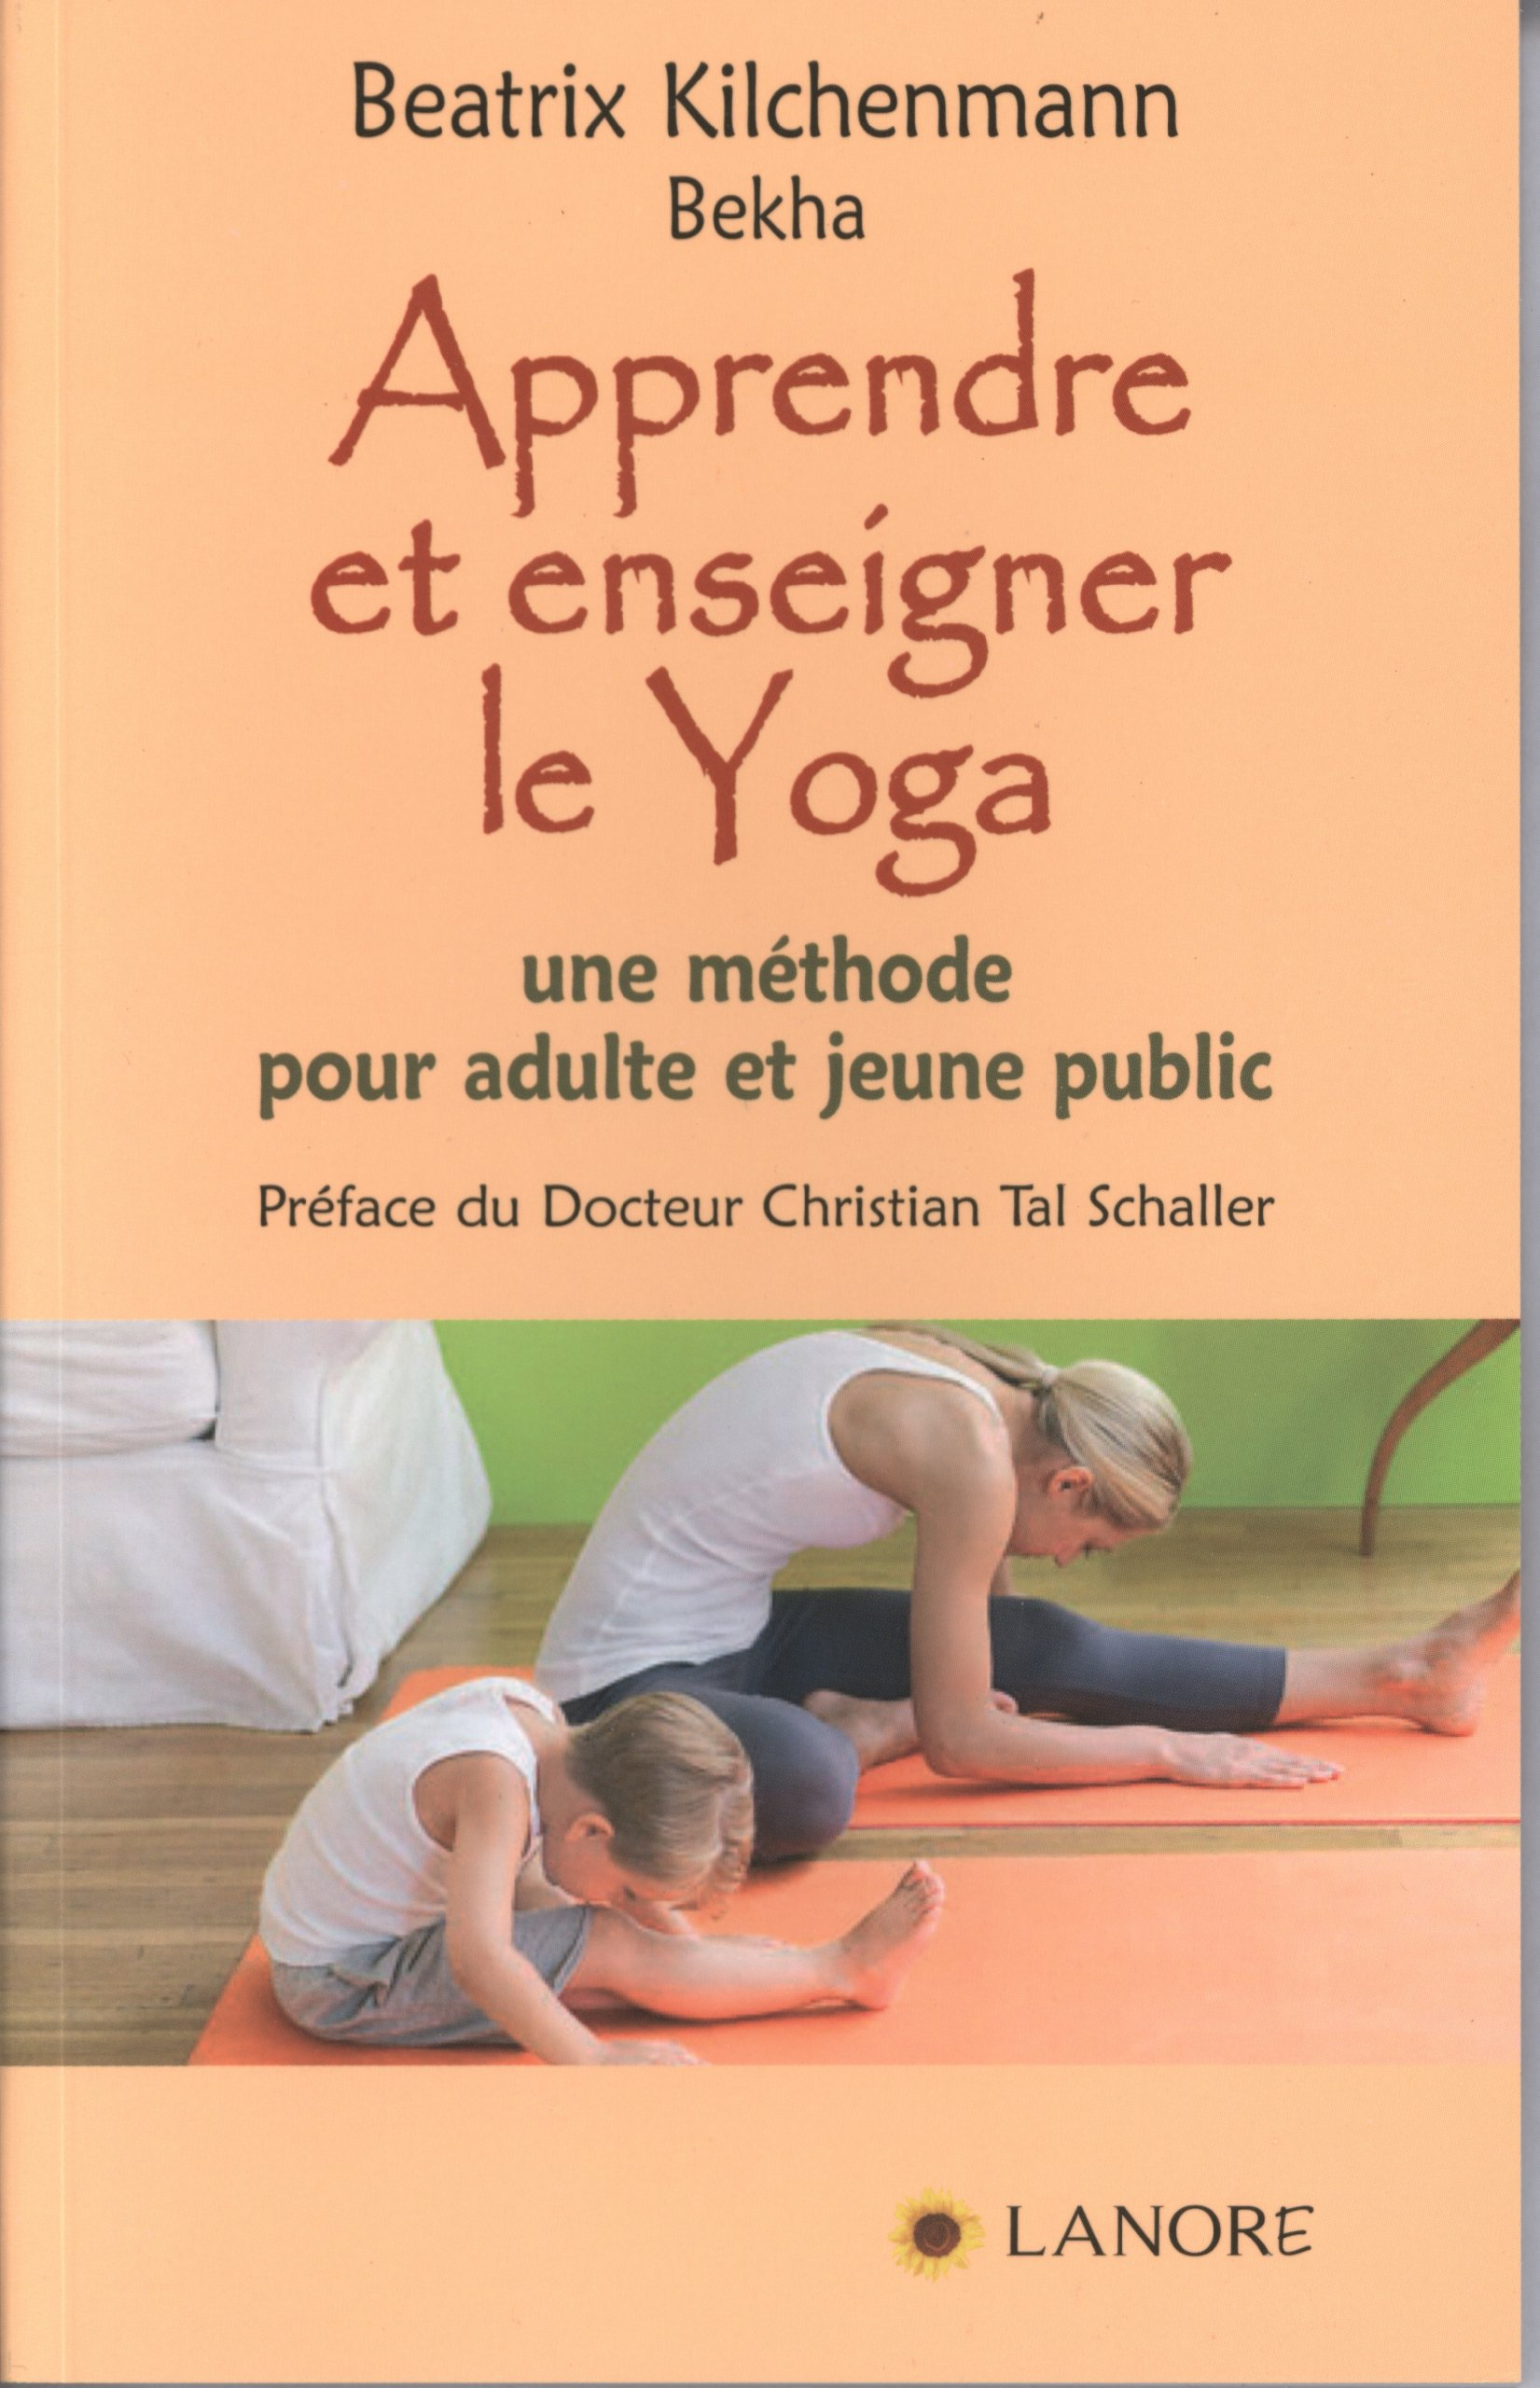 Apprendre et enseigner le Yoga: Beatrix Kilchenmann, Bekha ...